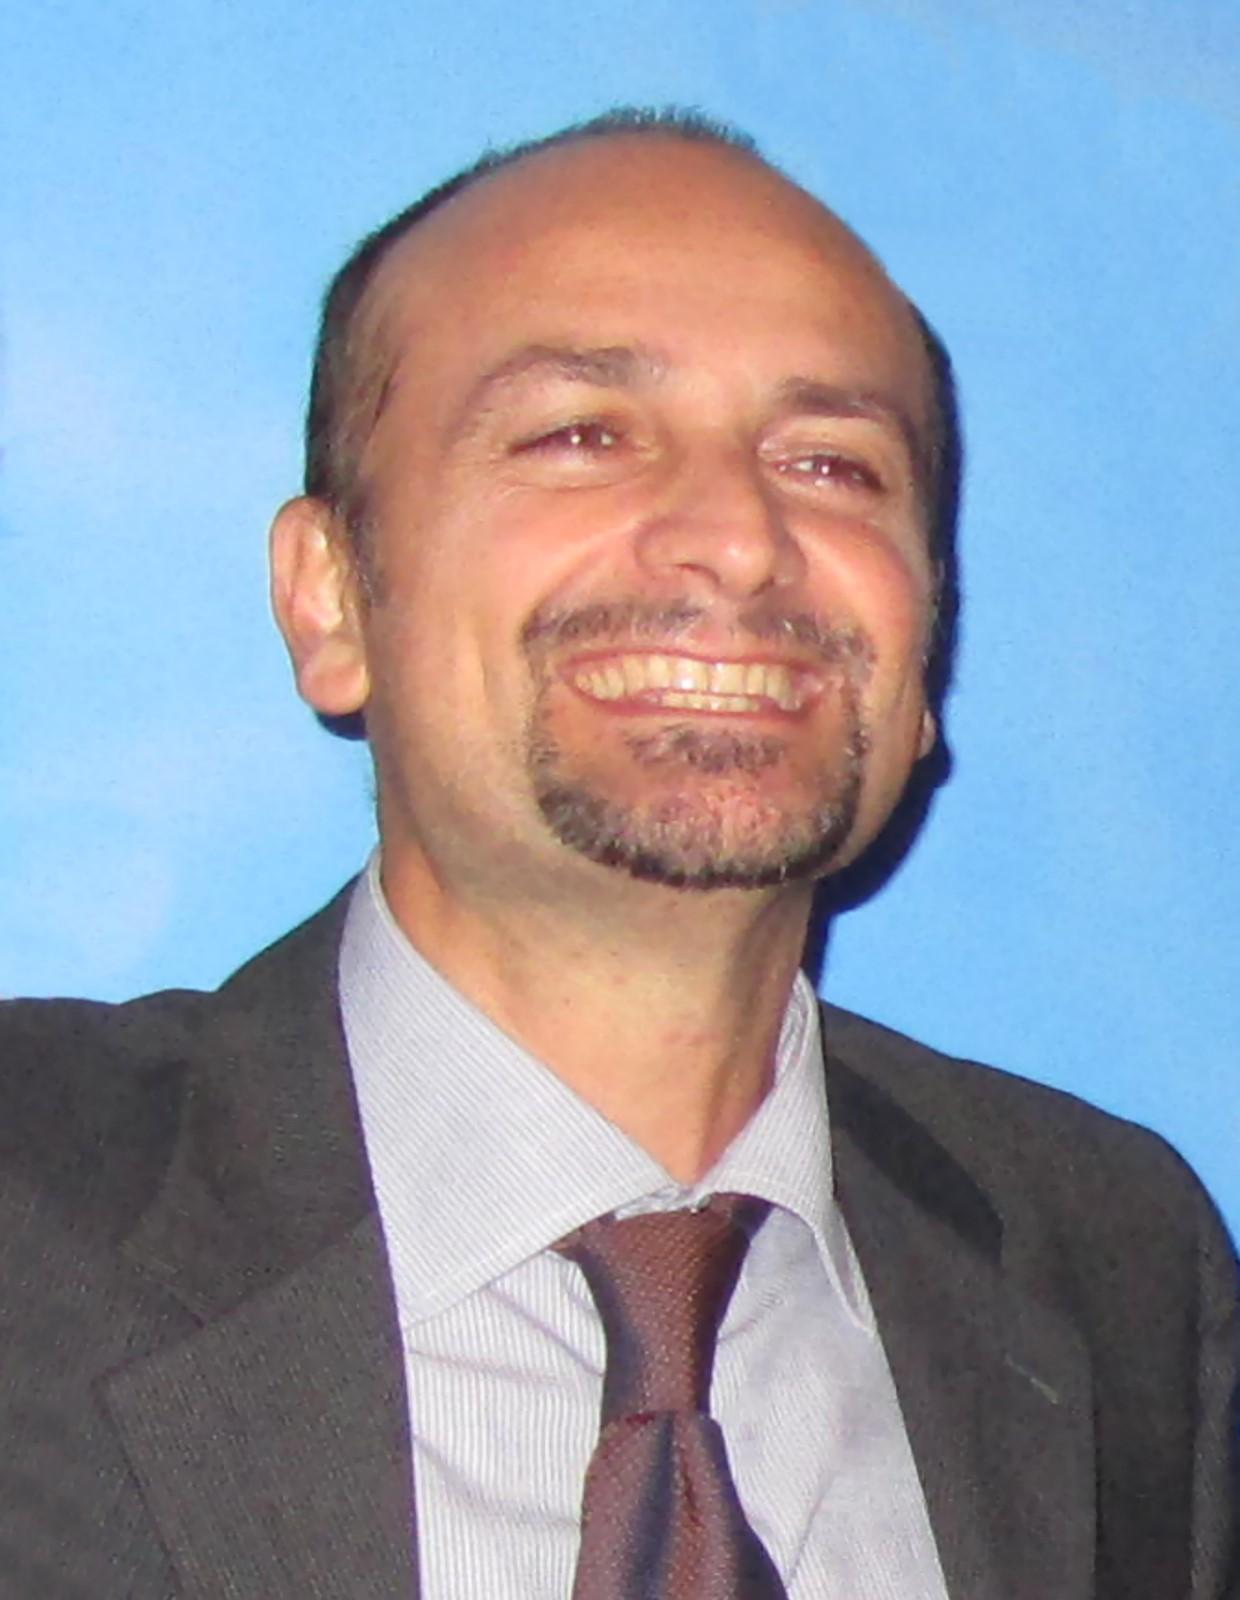 Gabriele Volpicelli